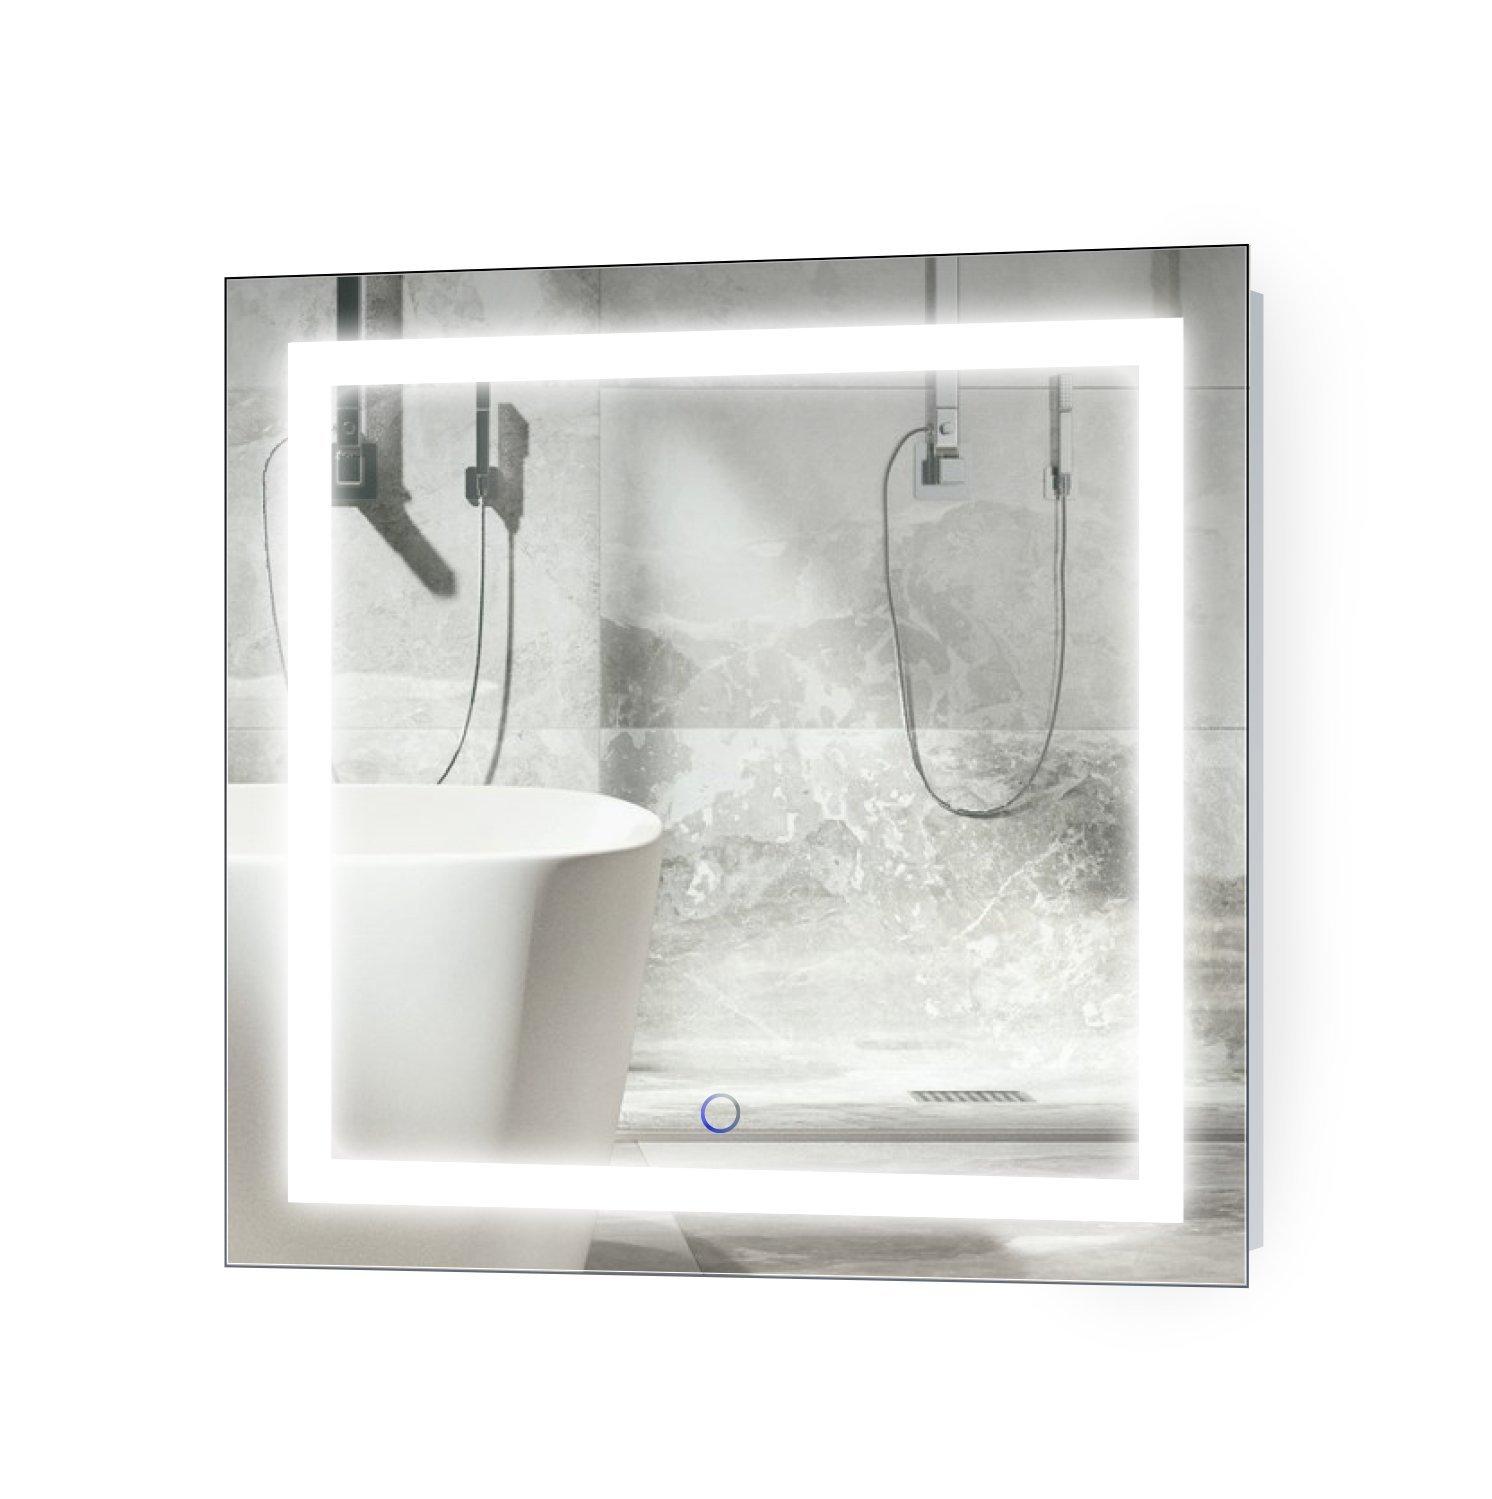 Kraus GV-651-ORB Tempered glass Solid brass Above counter Round Bathroom Sink, 16.5 x 16.5 x 5.5 inches, Bronze